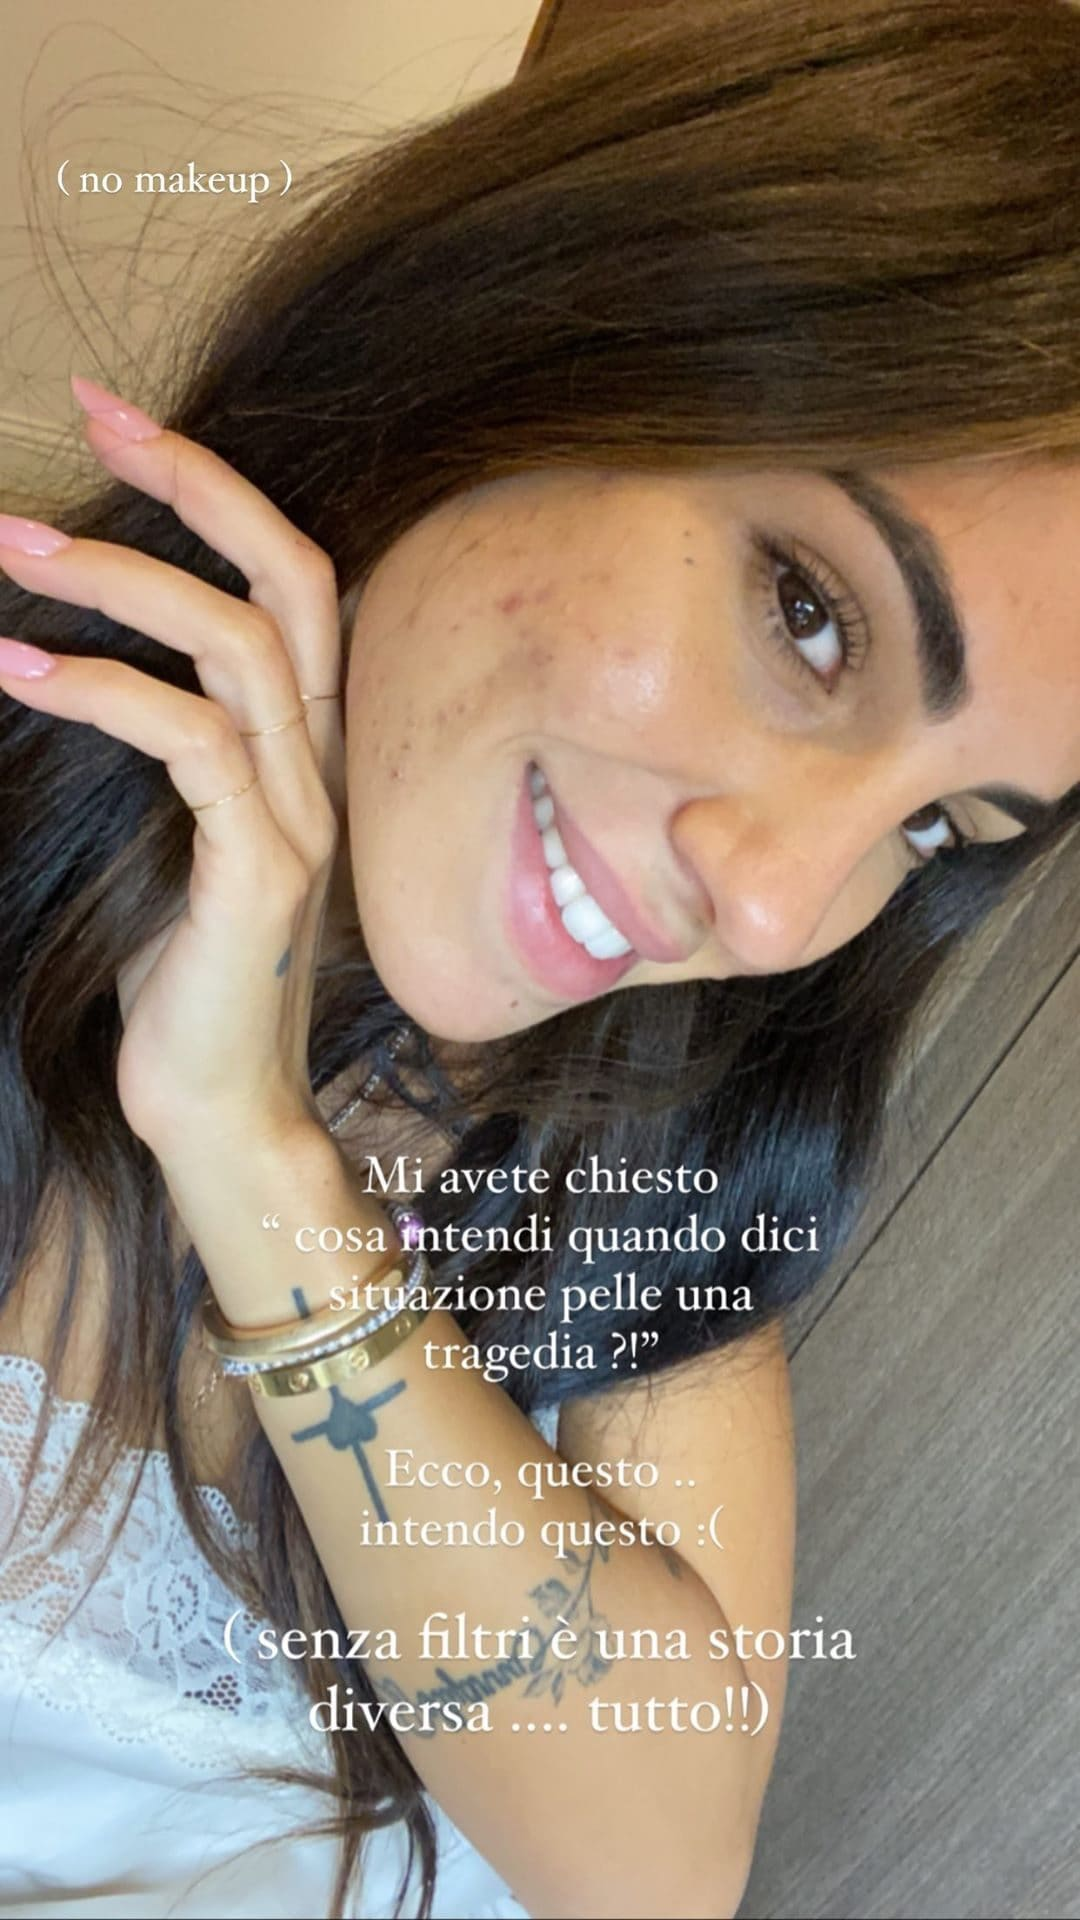 acne Giulia de lellis